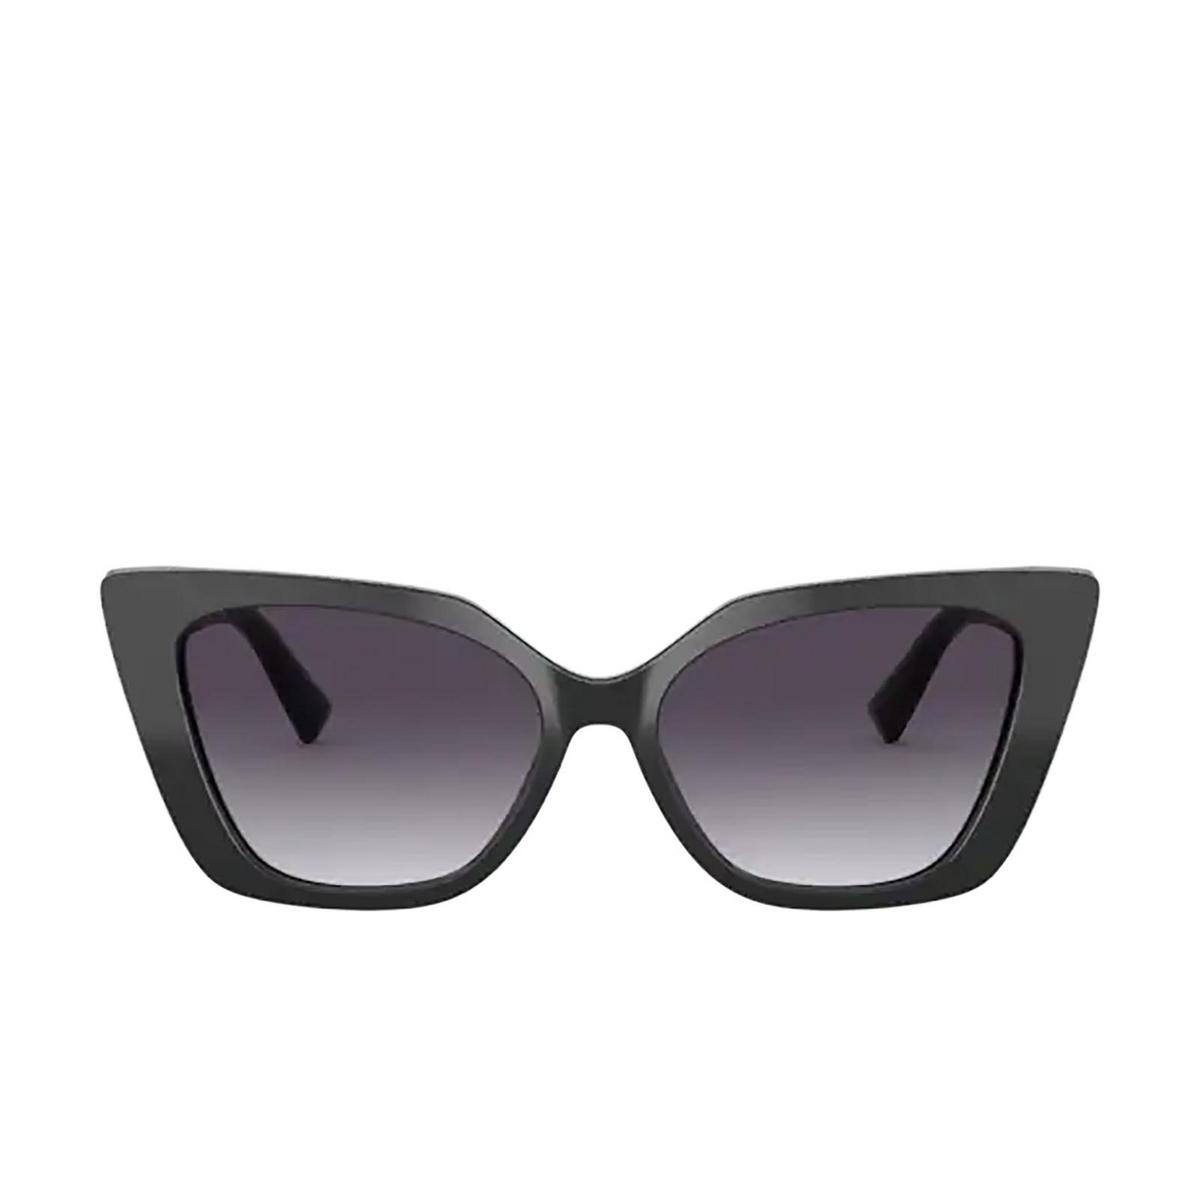 Valentino® Cat-eye Sunglasses: VA4073 color Black 50018G - front view.